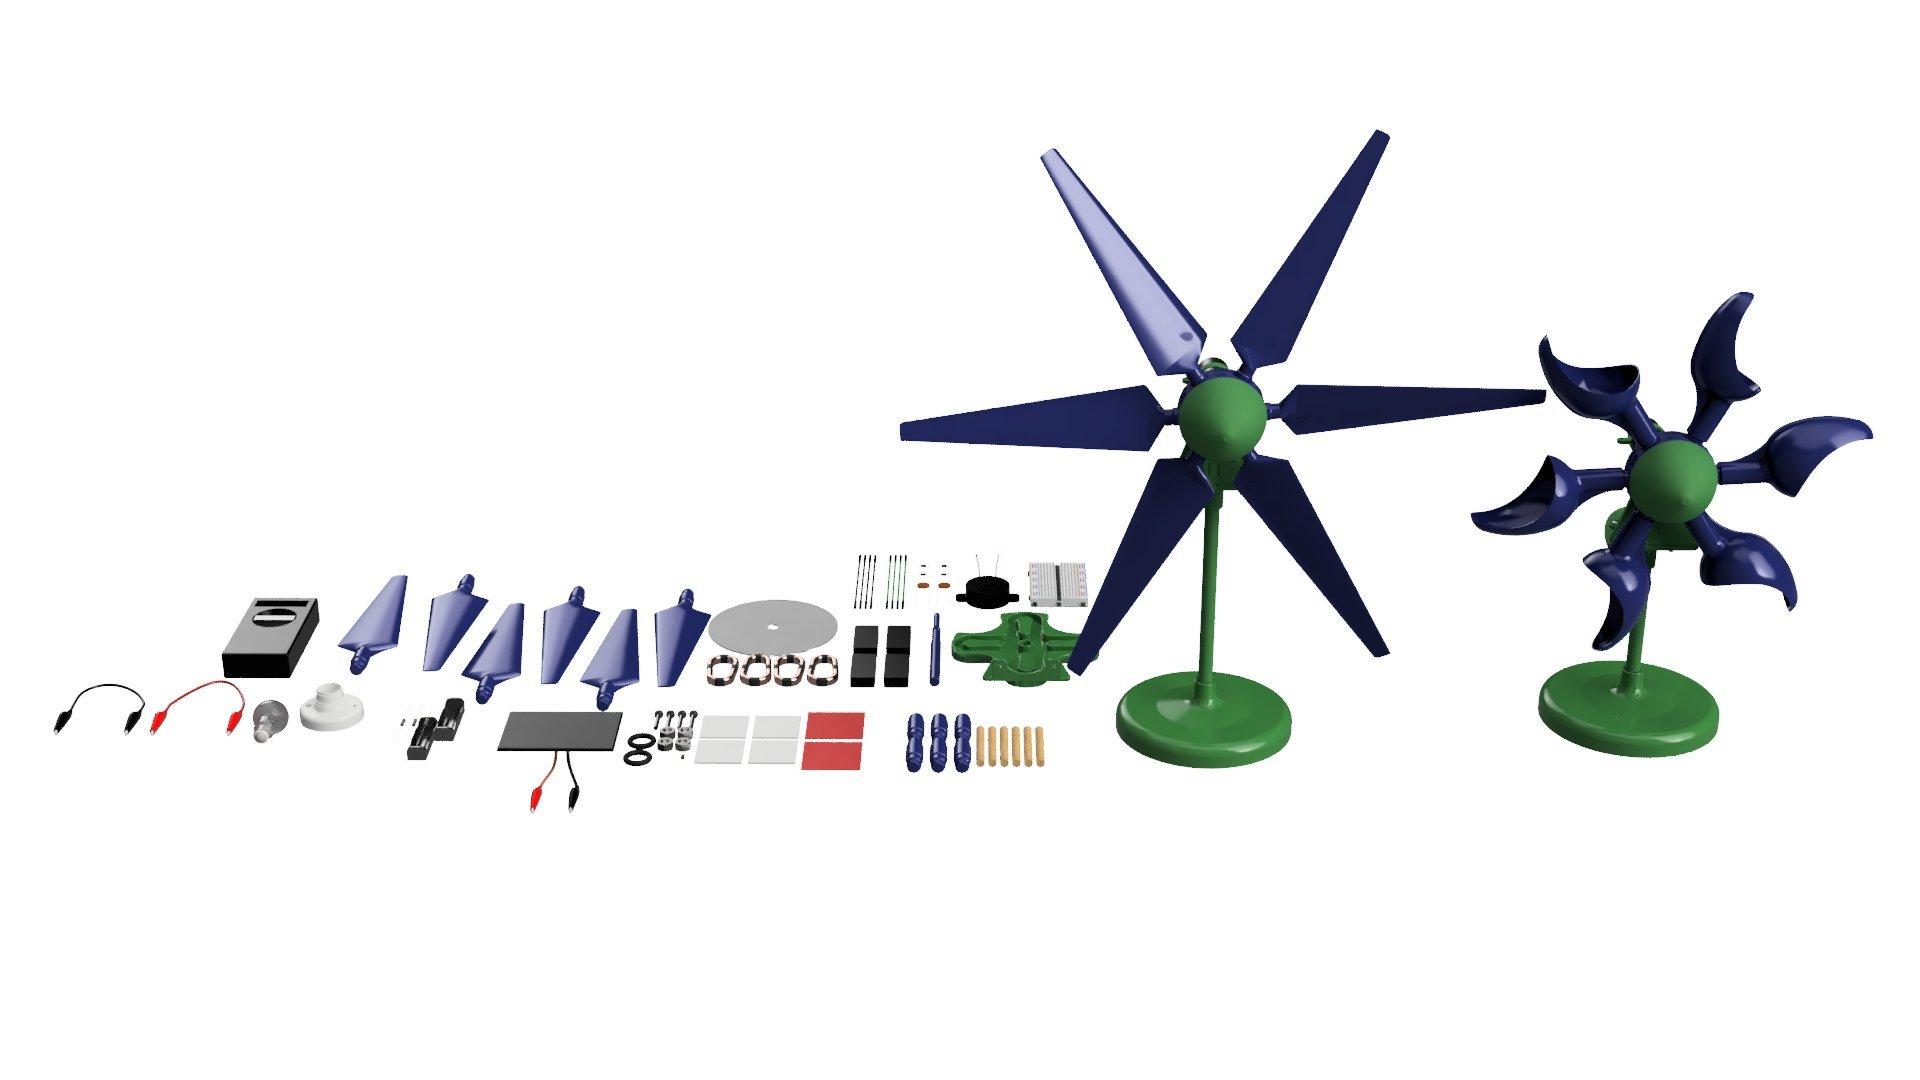 PicoTurbine Alternative Education Wind, Solar, Hydro, & Electricity Lab by PicoTurbine